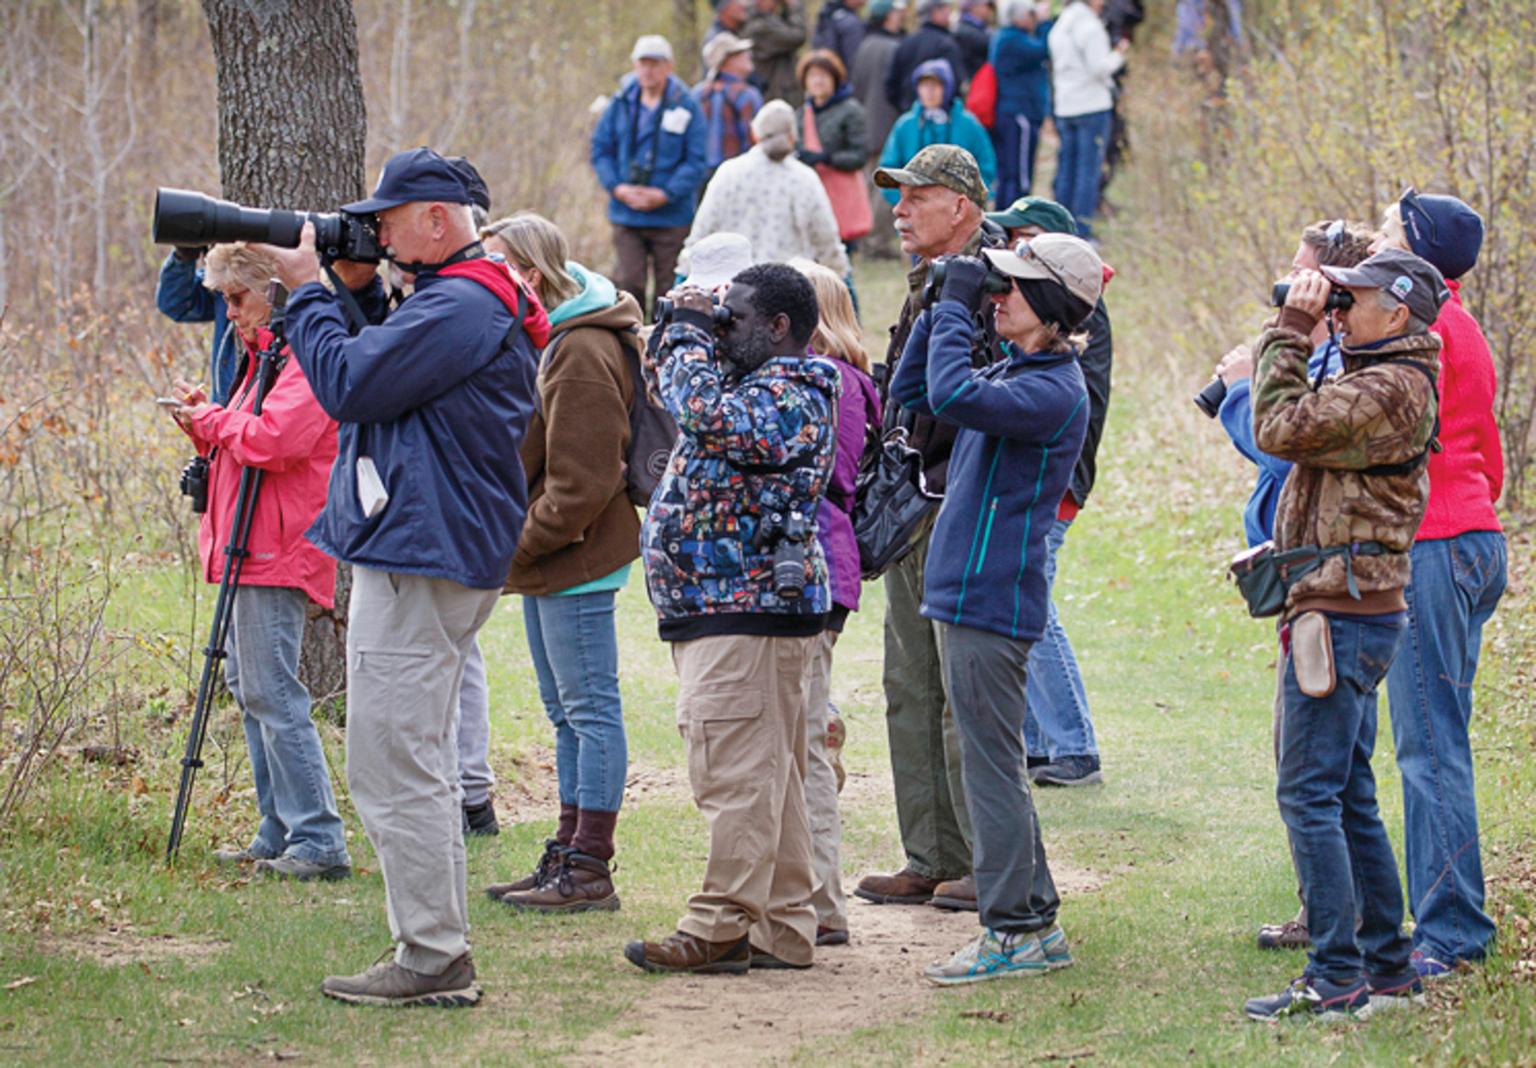 Birdwatchers at Sherburne National Wildlife Refuge in Zimmerman